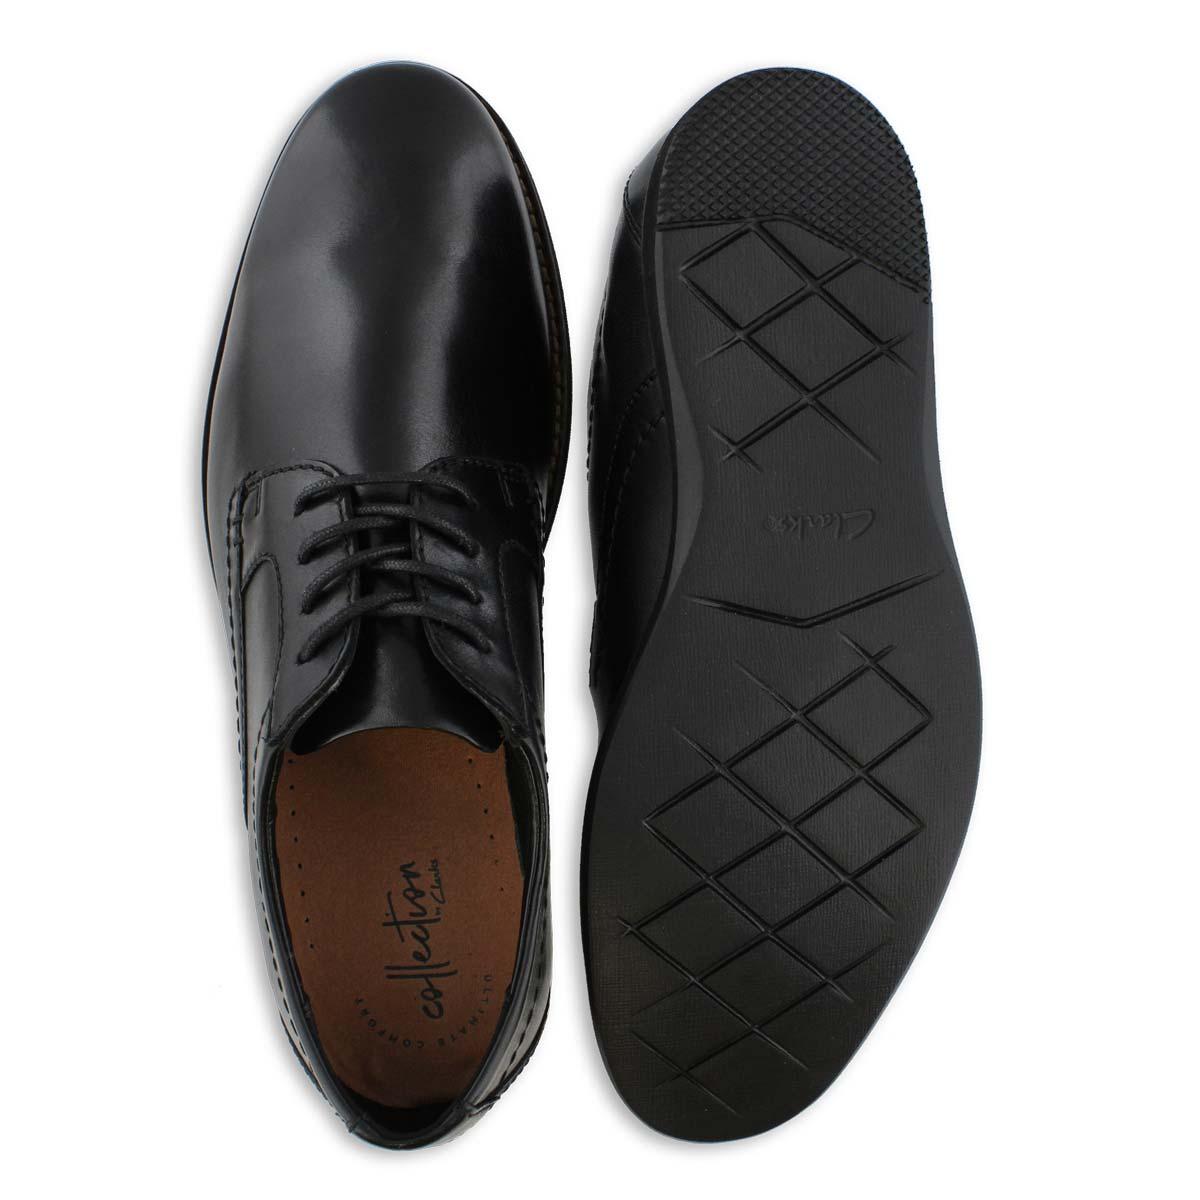 Men's RAHARTO PLAIN blk leather dress oxfords